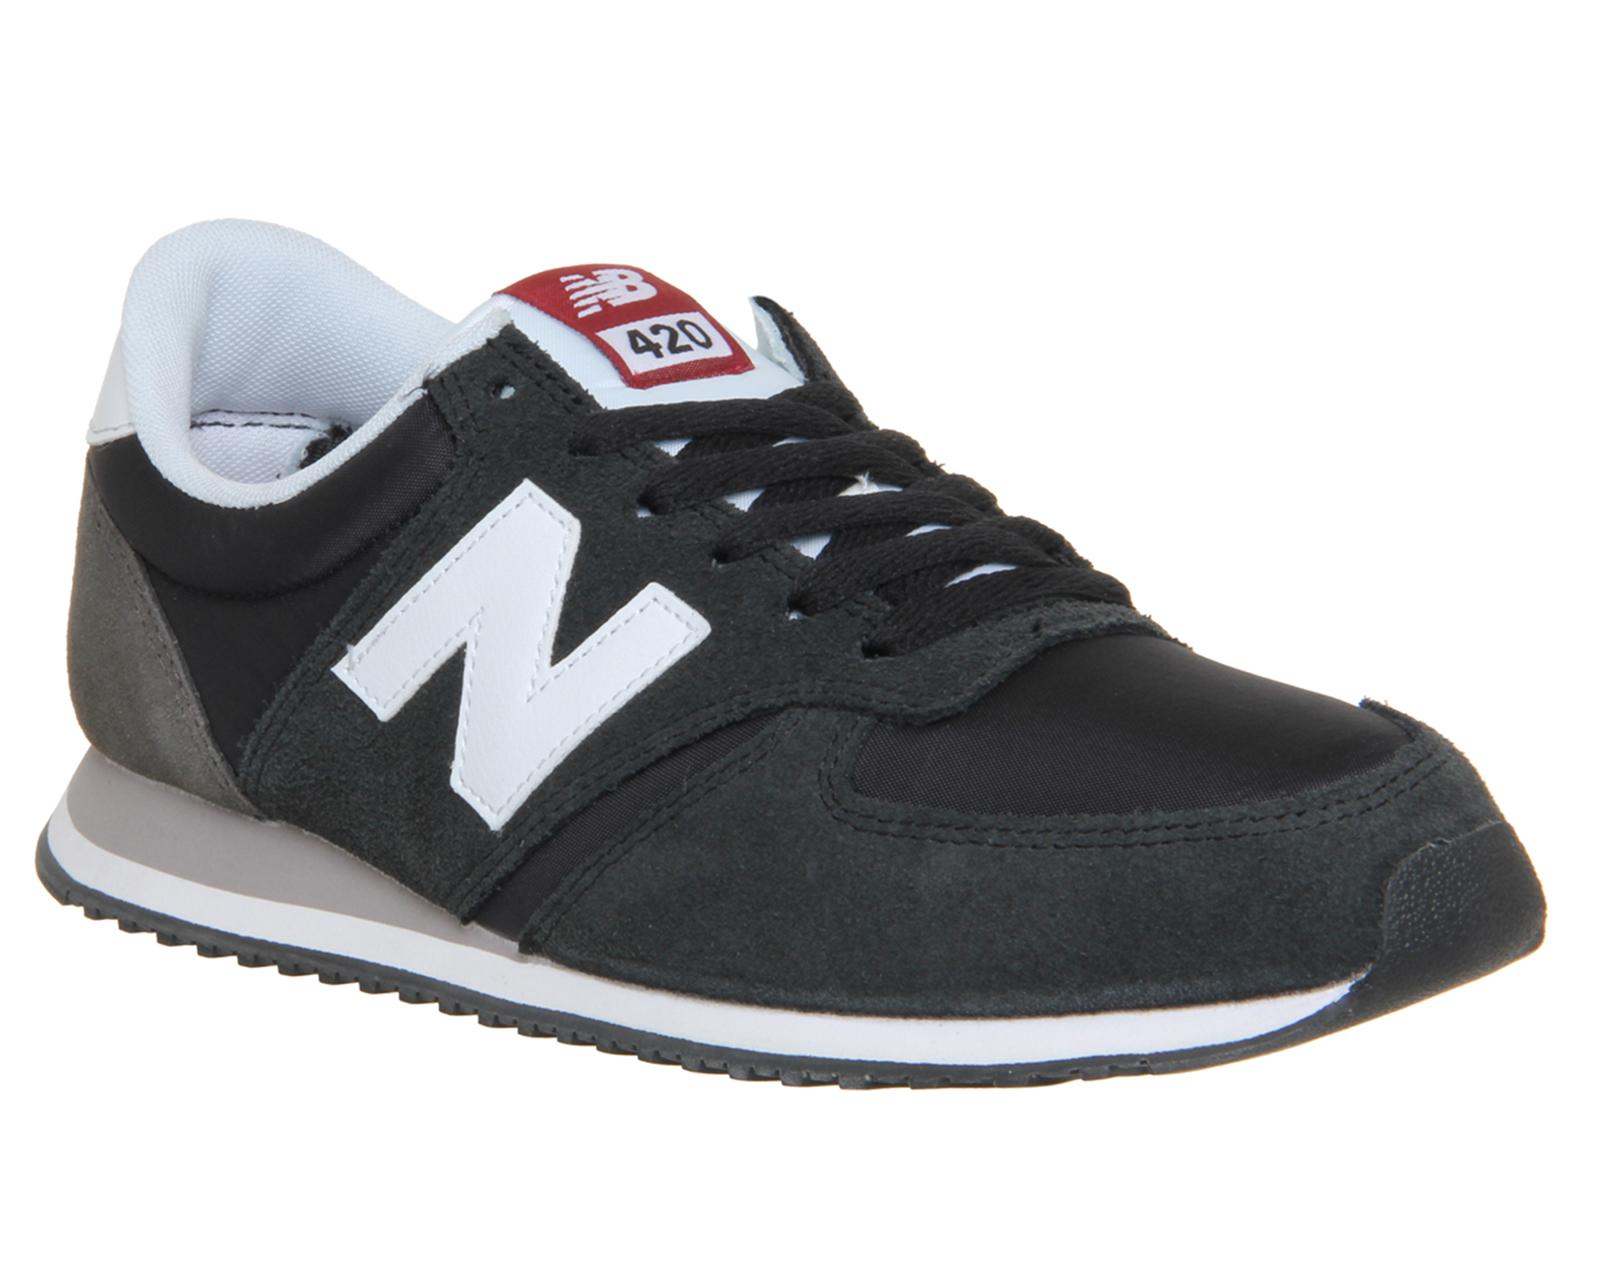 mens new balance u420 trainers black white trainers shoes. Black Bedroom Furniture Sets. Home Design Ideas